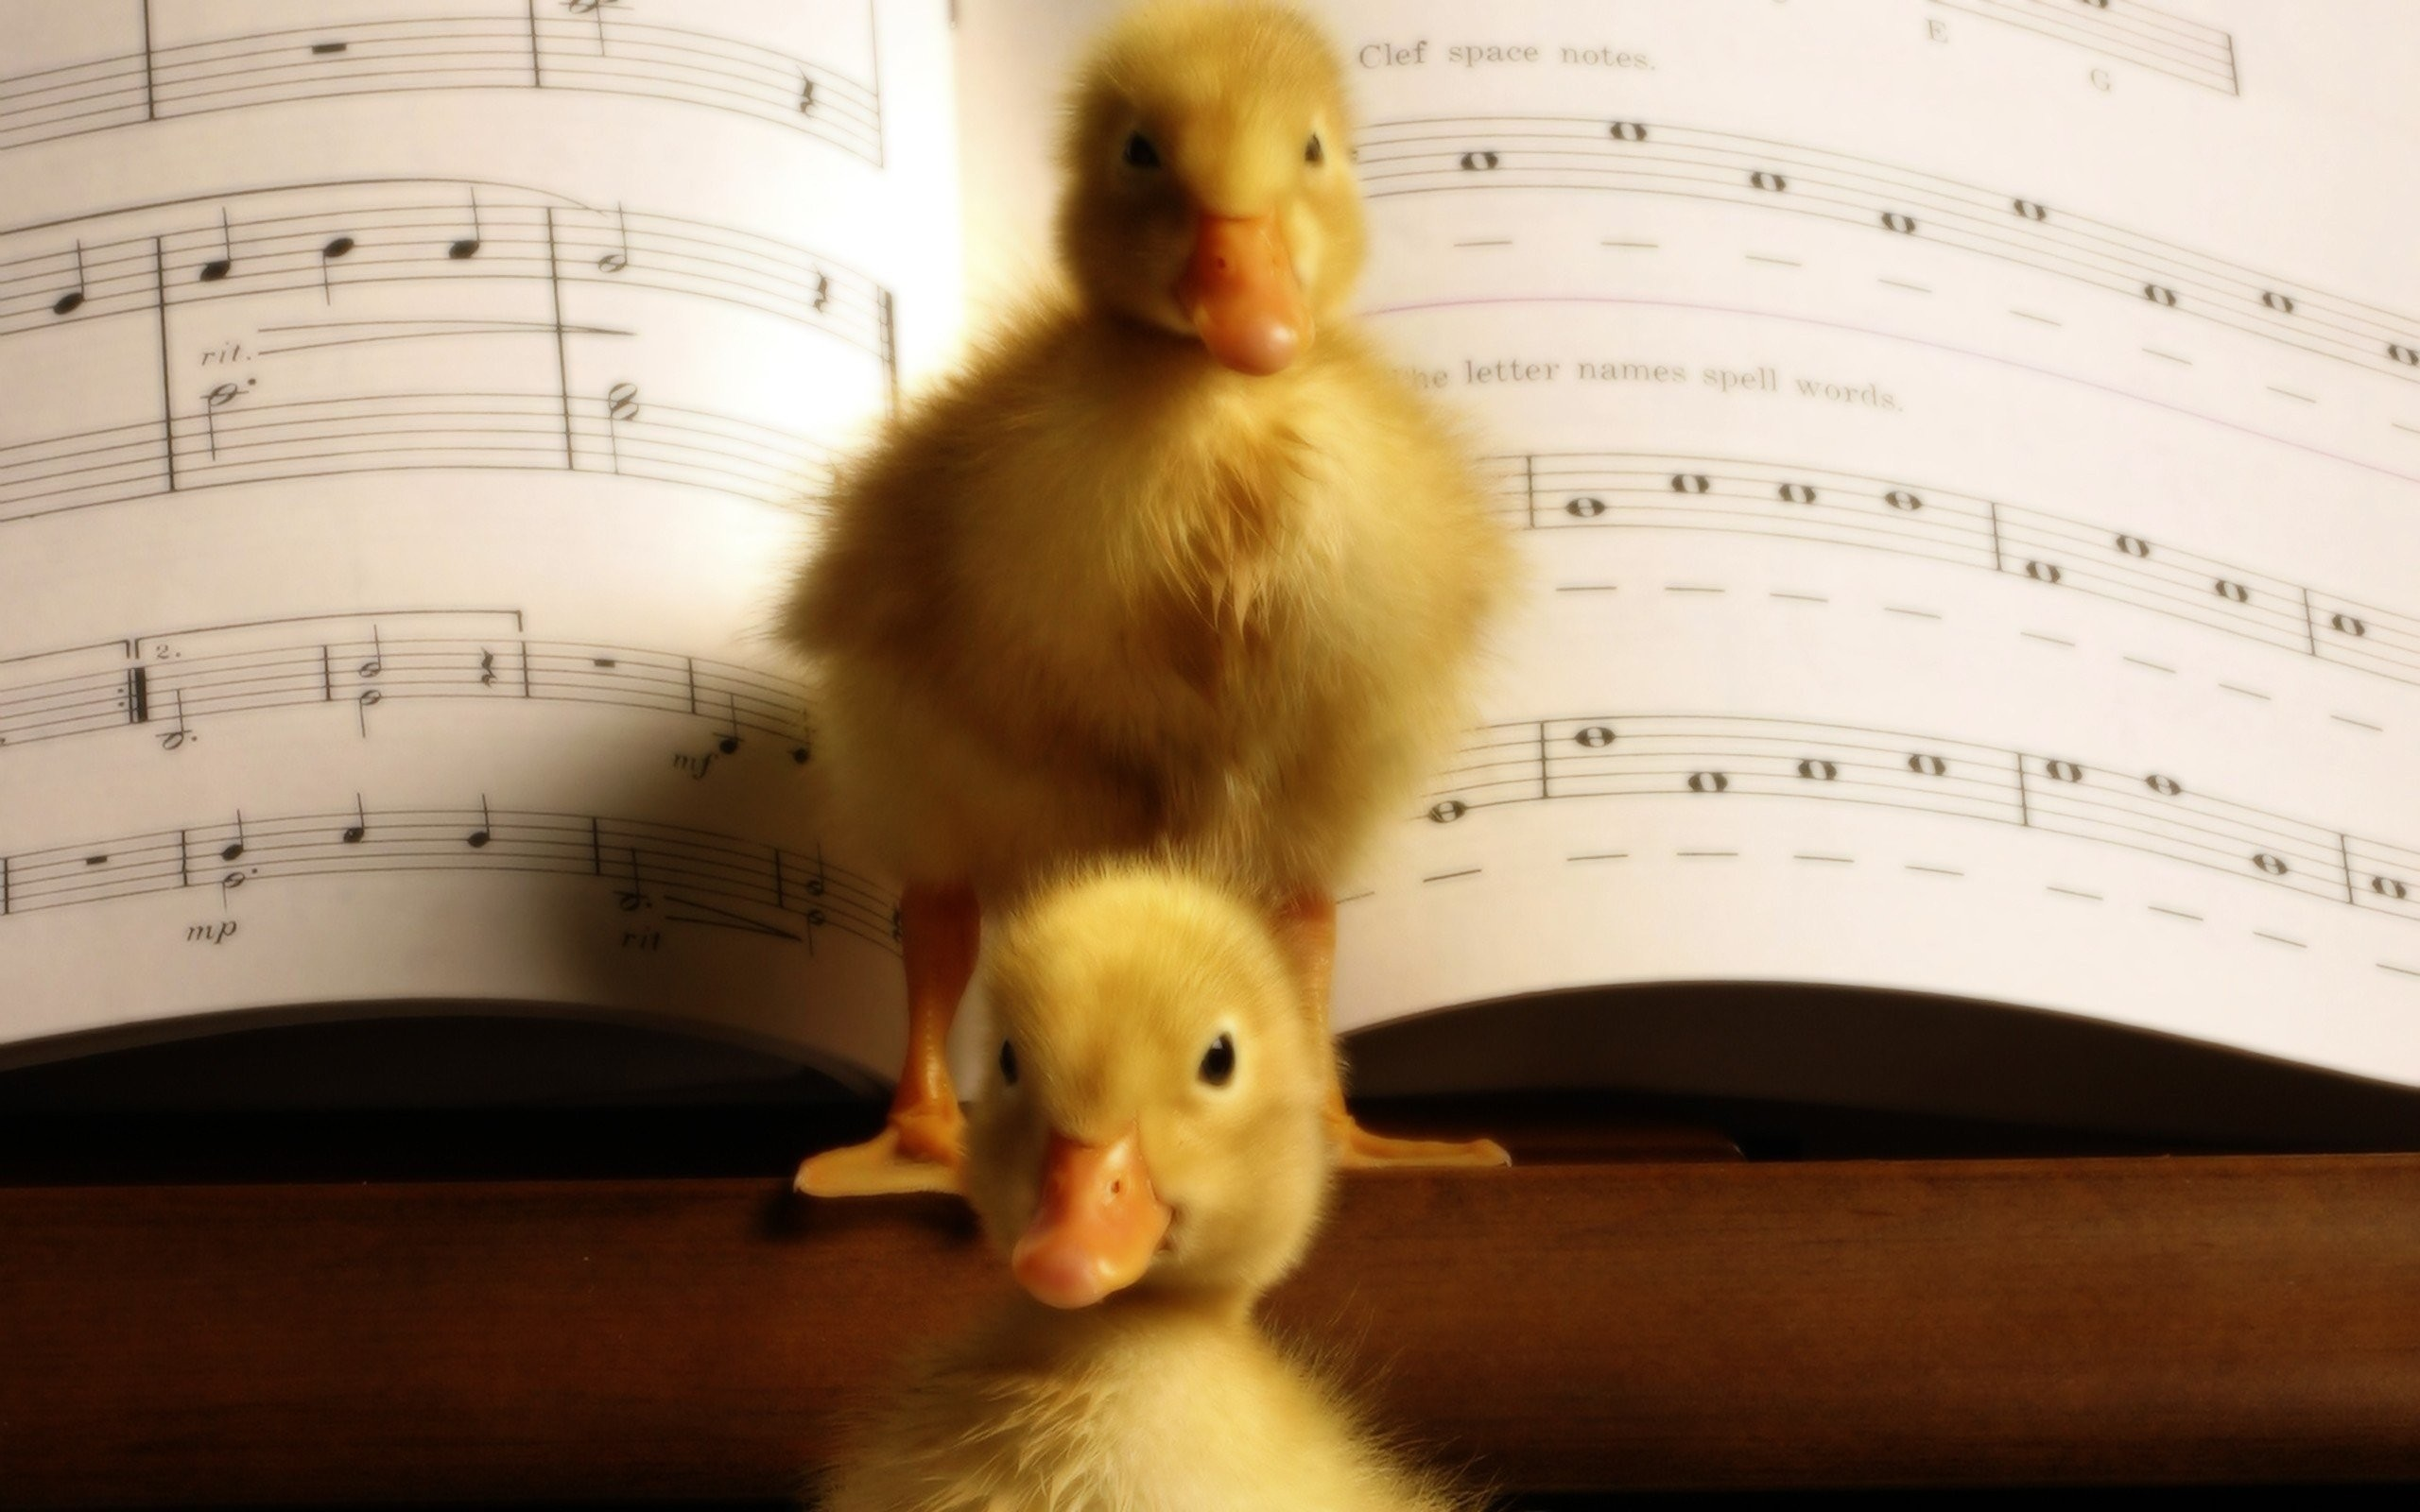 Birds animals ducks duckling musical musical notes baby birds wallpaper |  | 236569 | WallpaperUP